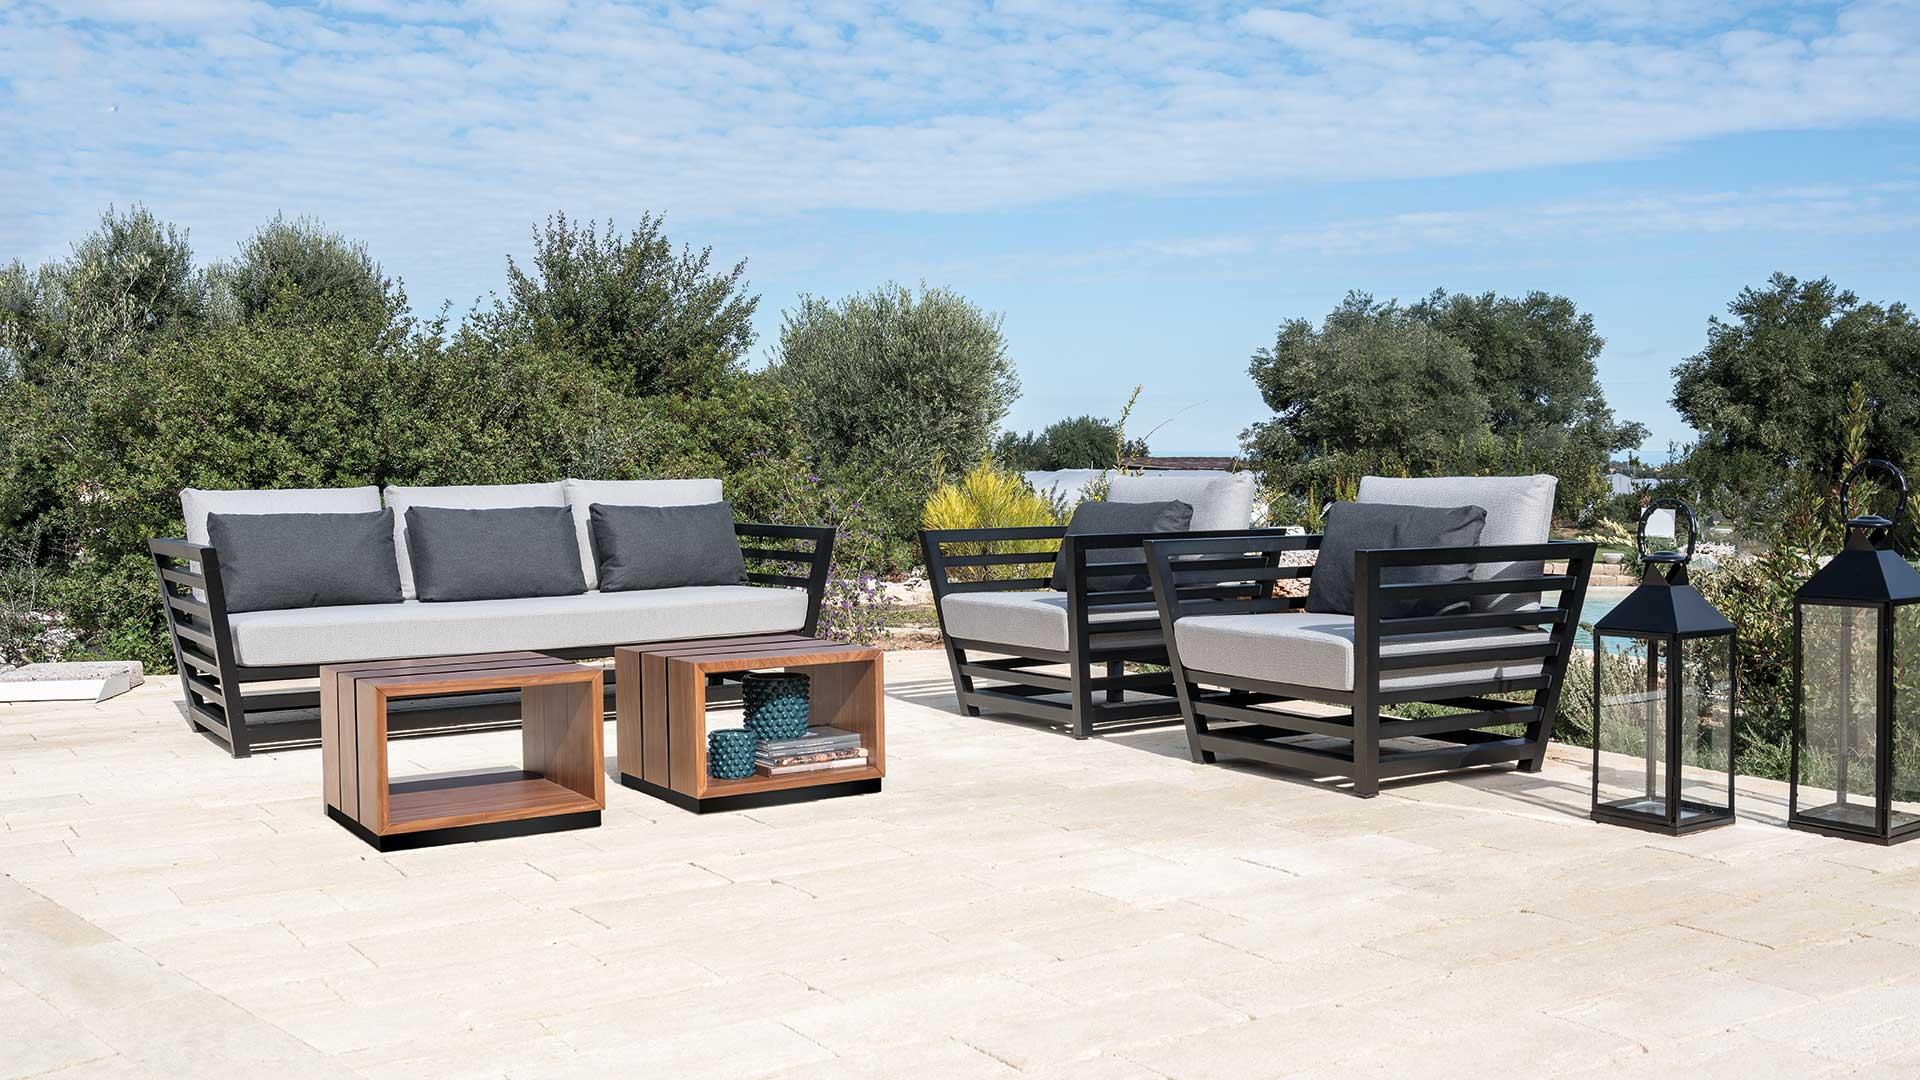 Arredo giardino moderno tendenze per l 39 arredamento esterno arredo in - Happy casa arredo giardino ...